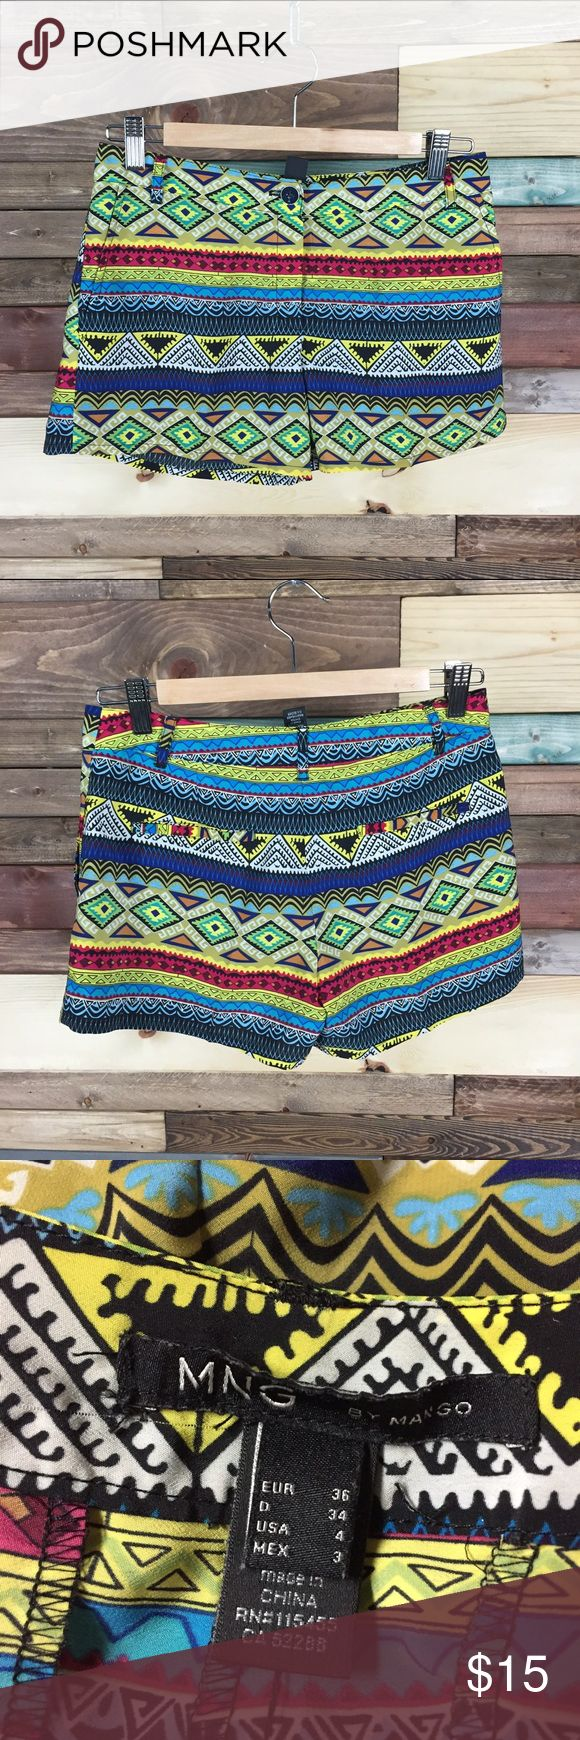 "MNG Bright Tribal Shorts - 4 MNG Bright Tribal Shorts - 4  Waist (laying flat): 14.5"" Rise: 9"" Inseam: 3""  #woodsnap #mng #tribal #bright #multicolor #shorts Mango Shorts"